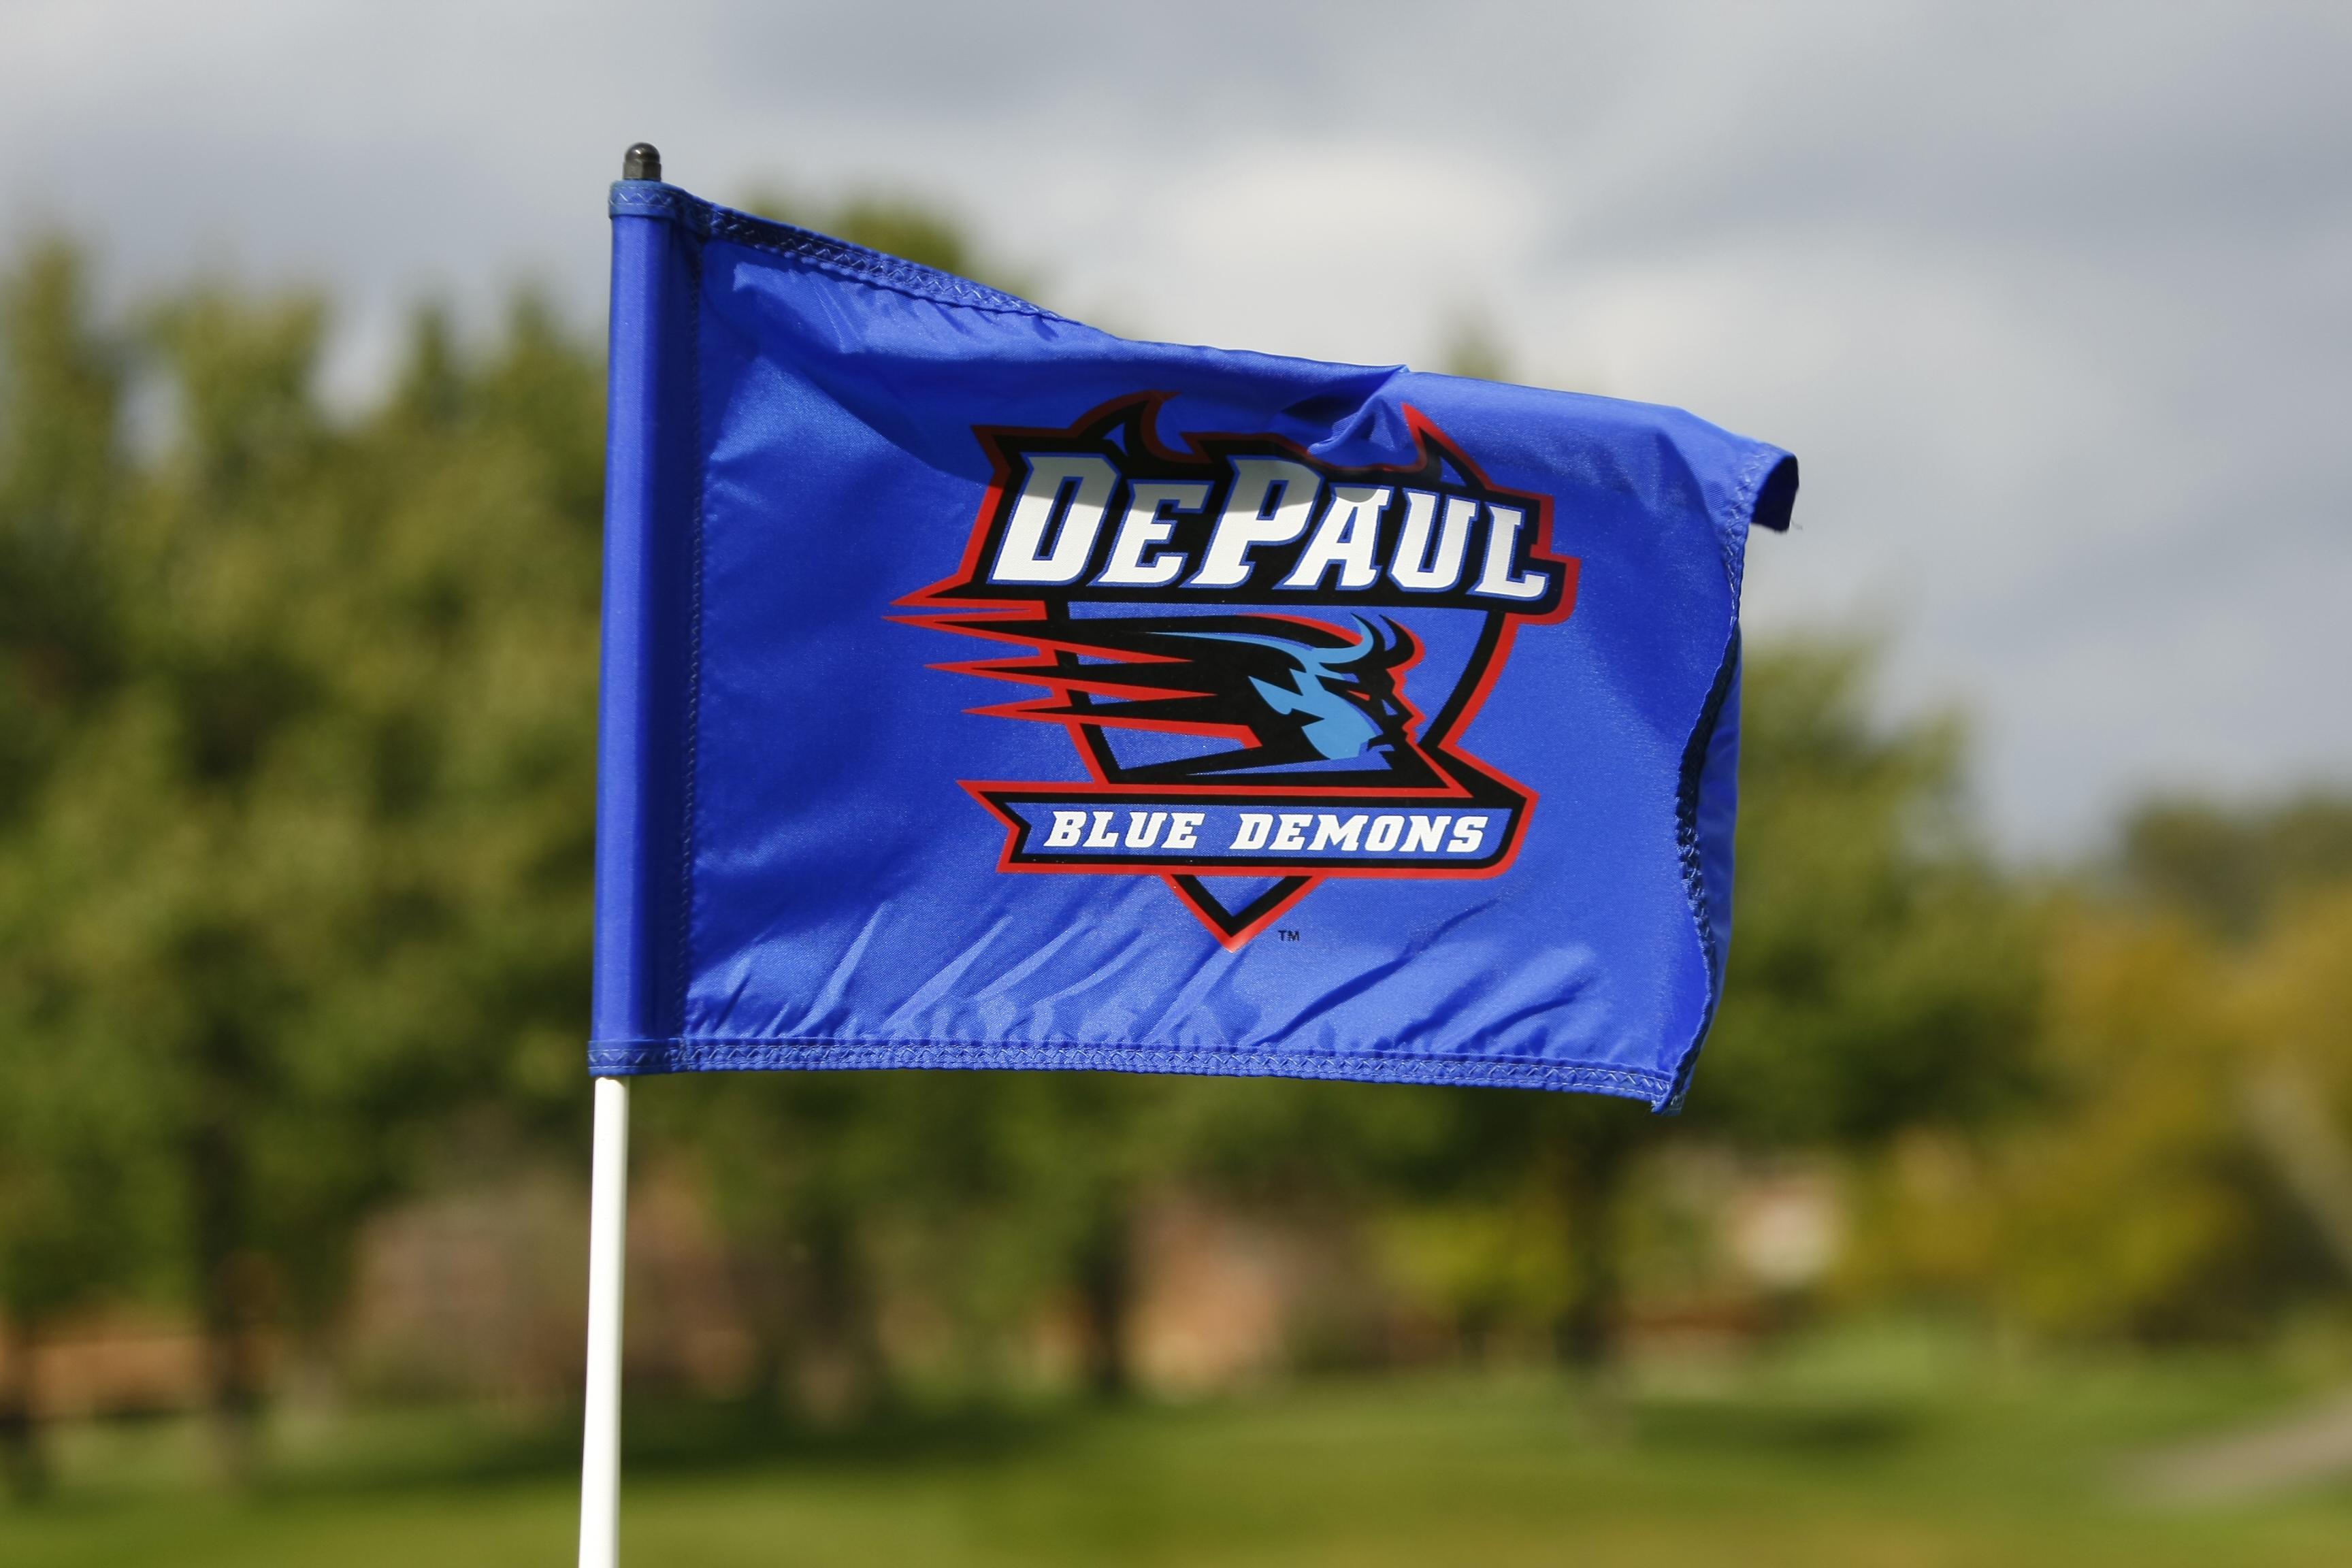 2019 D-Club Golf Outing